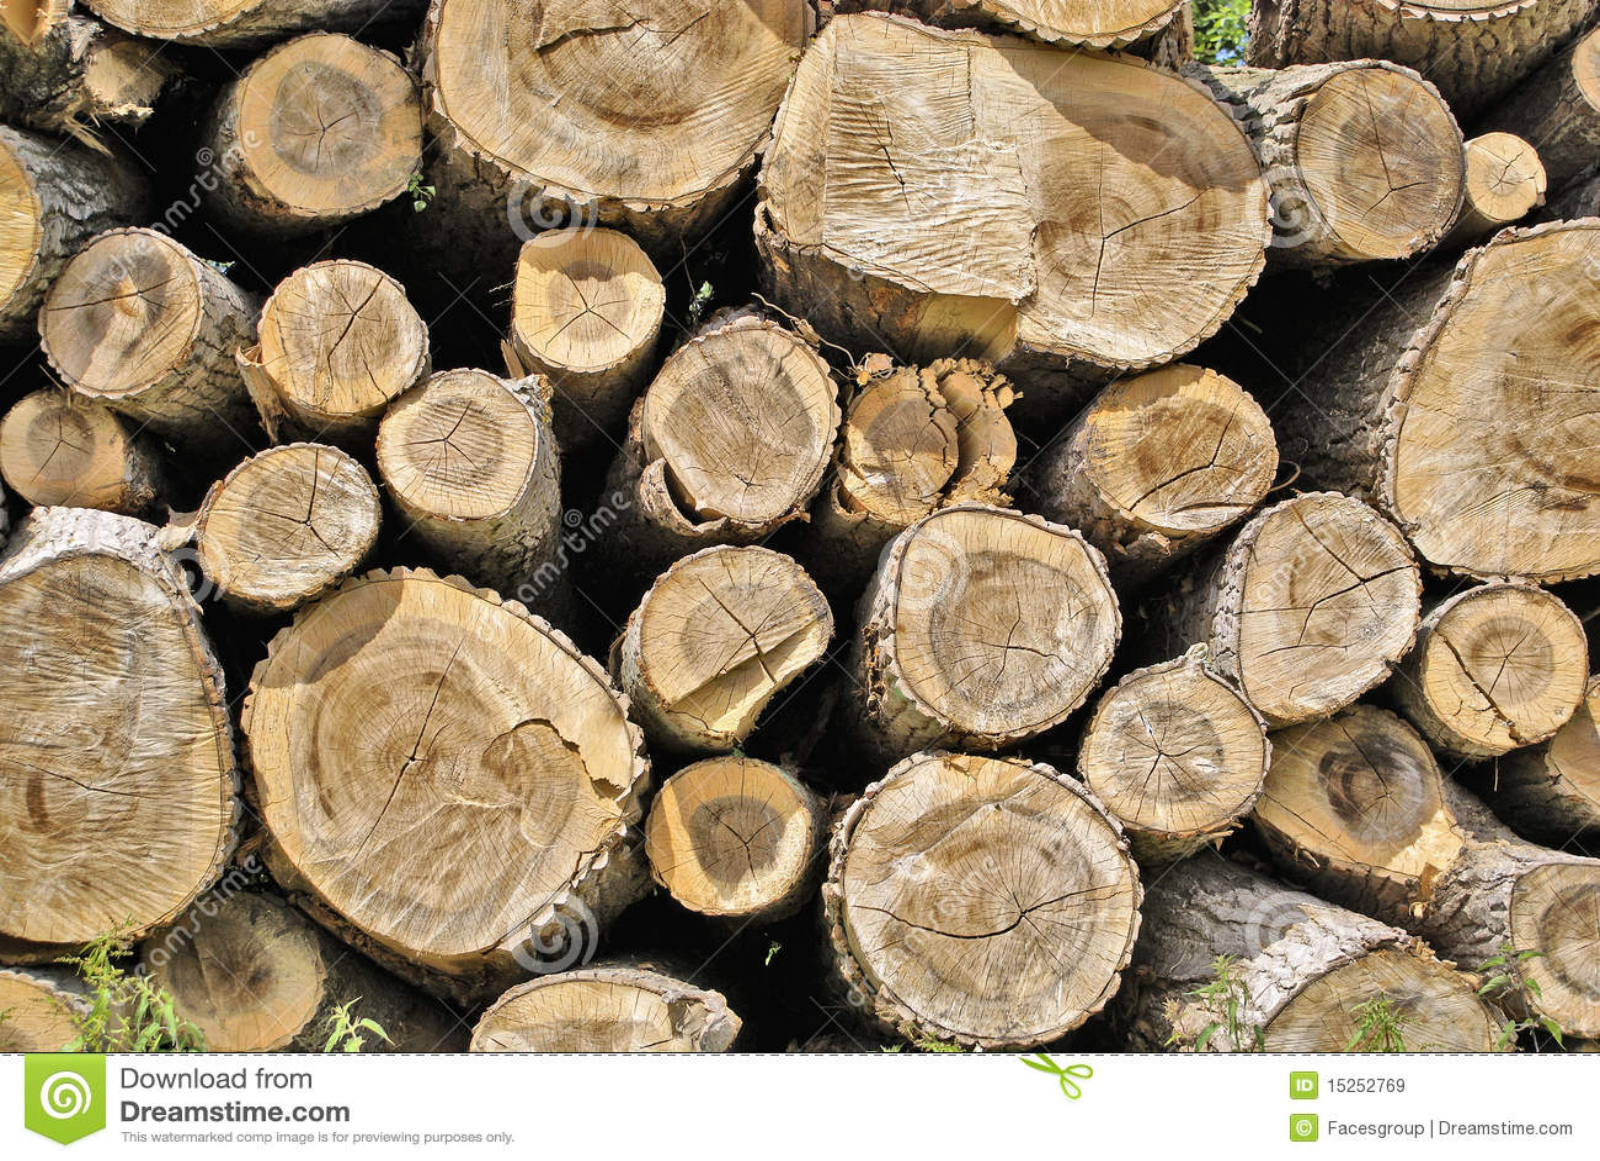 Download Pile of Wood stock image. Image of energy, macro, growth - 15252769